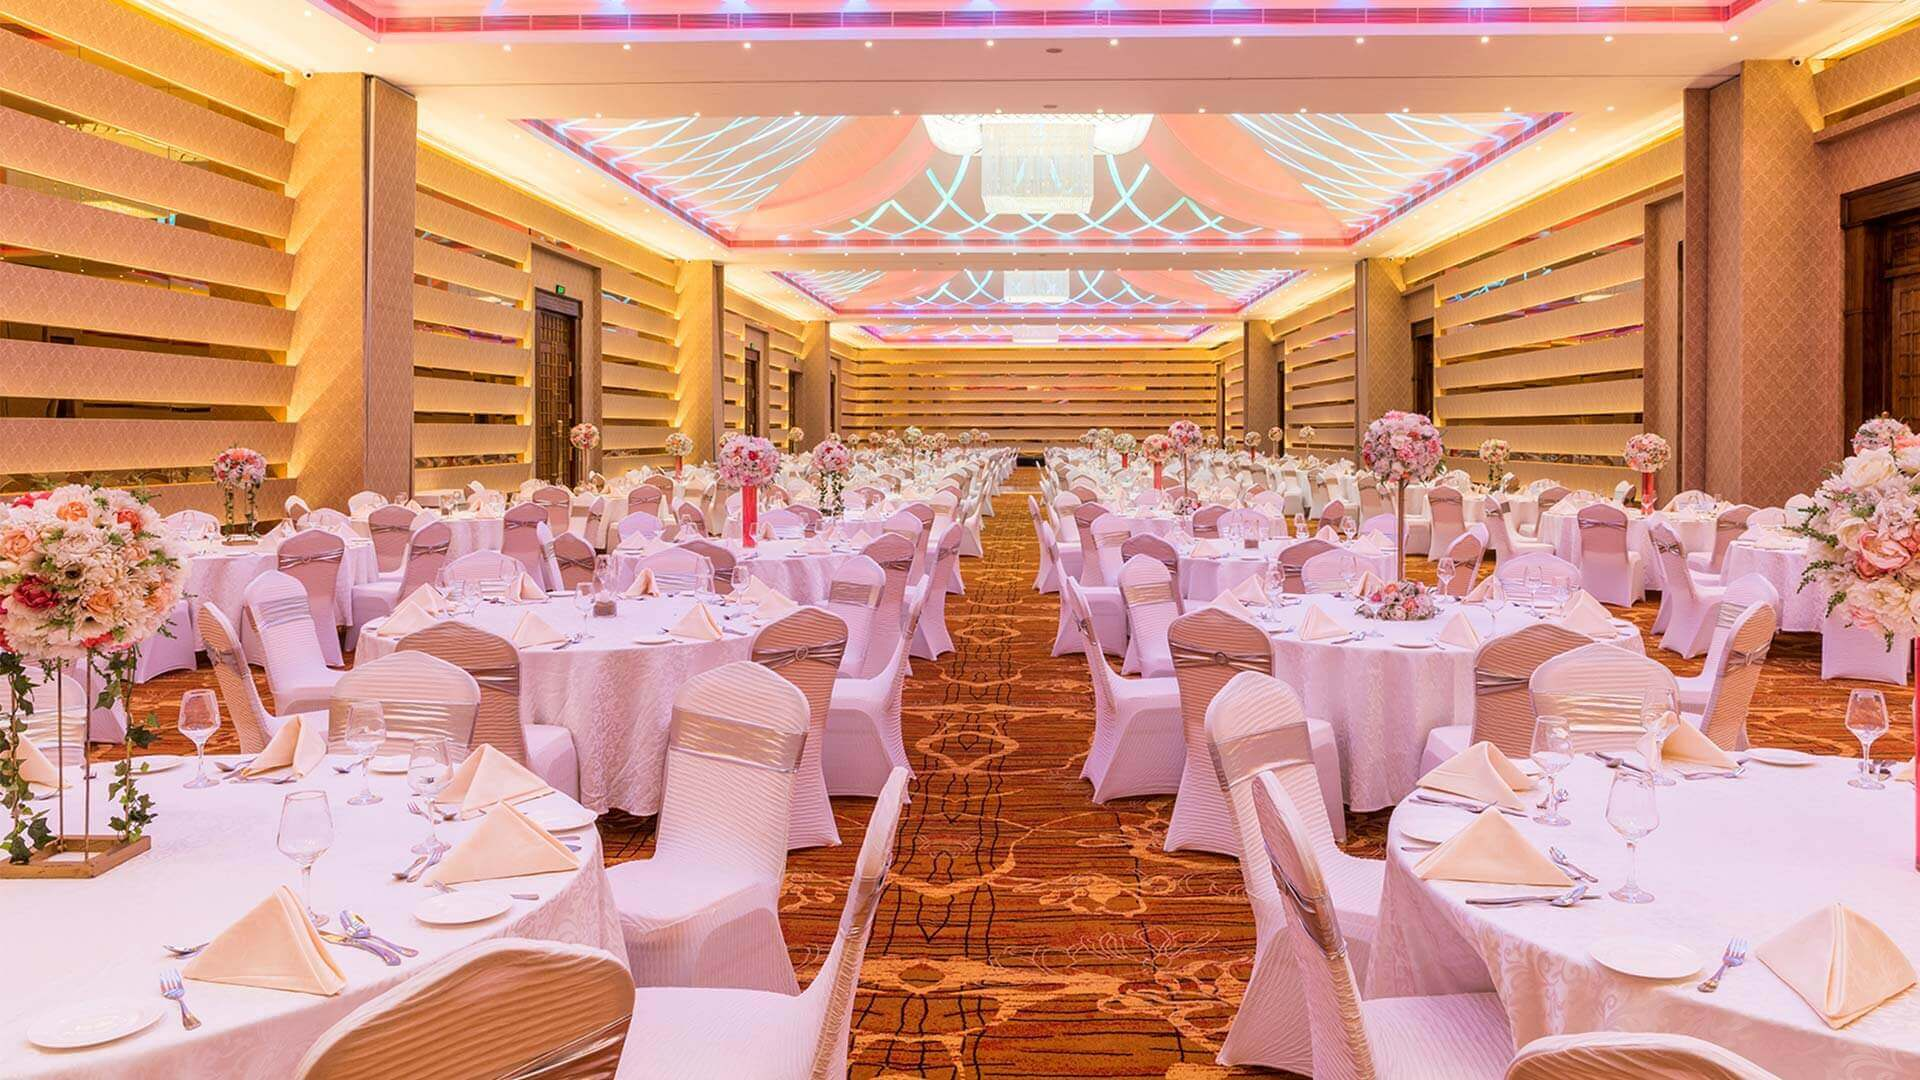 The Golden Crown - Grand Ballroom